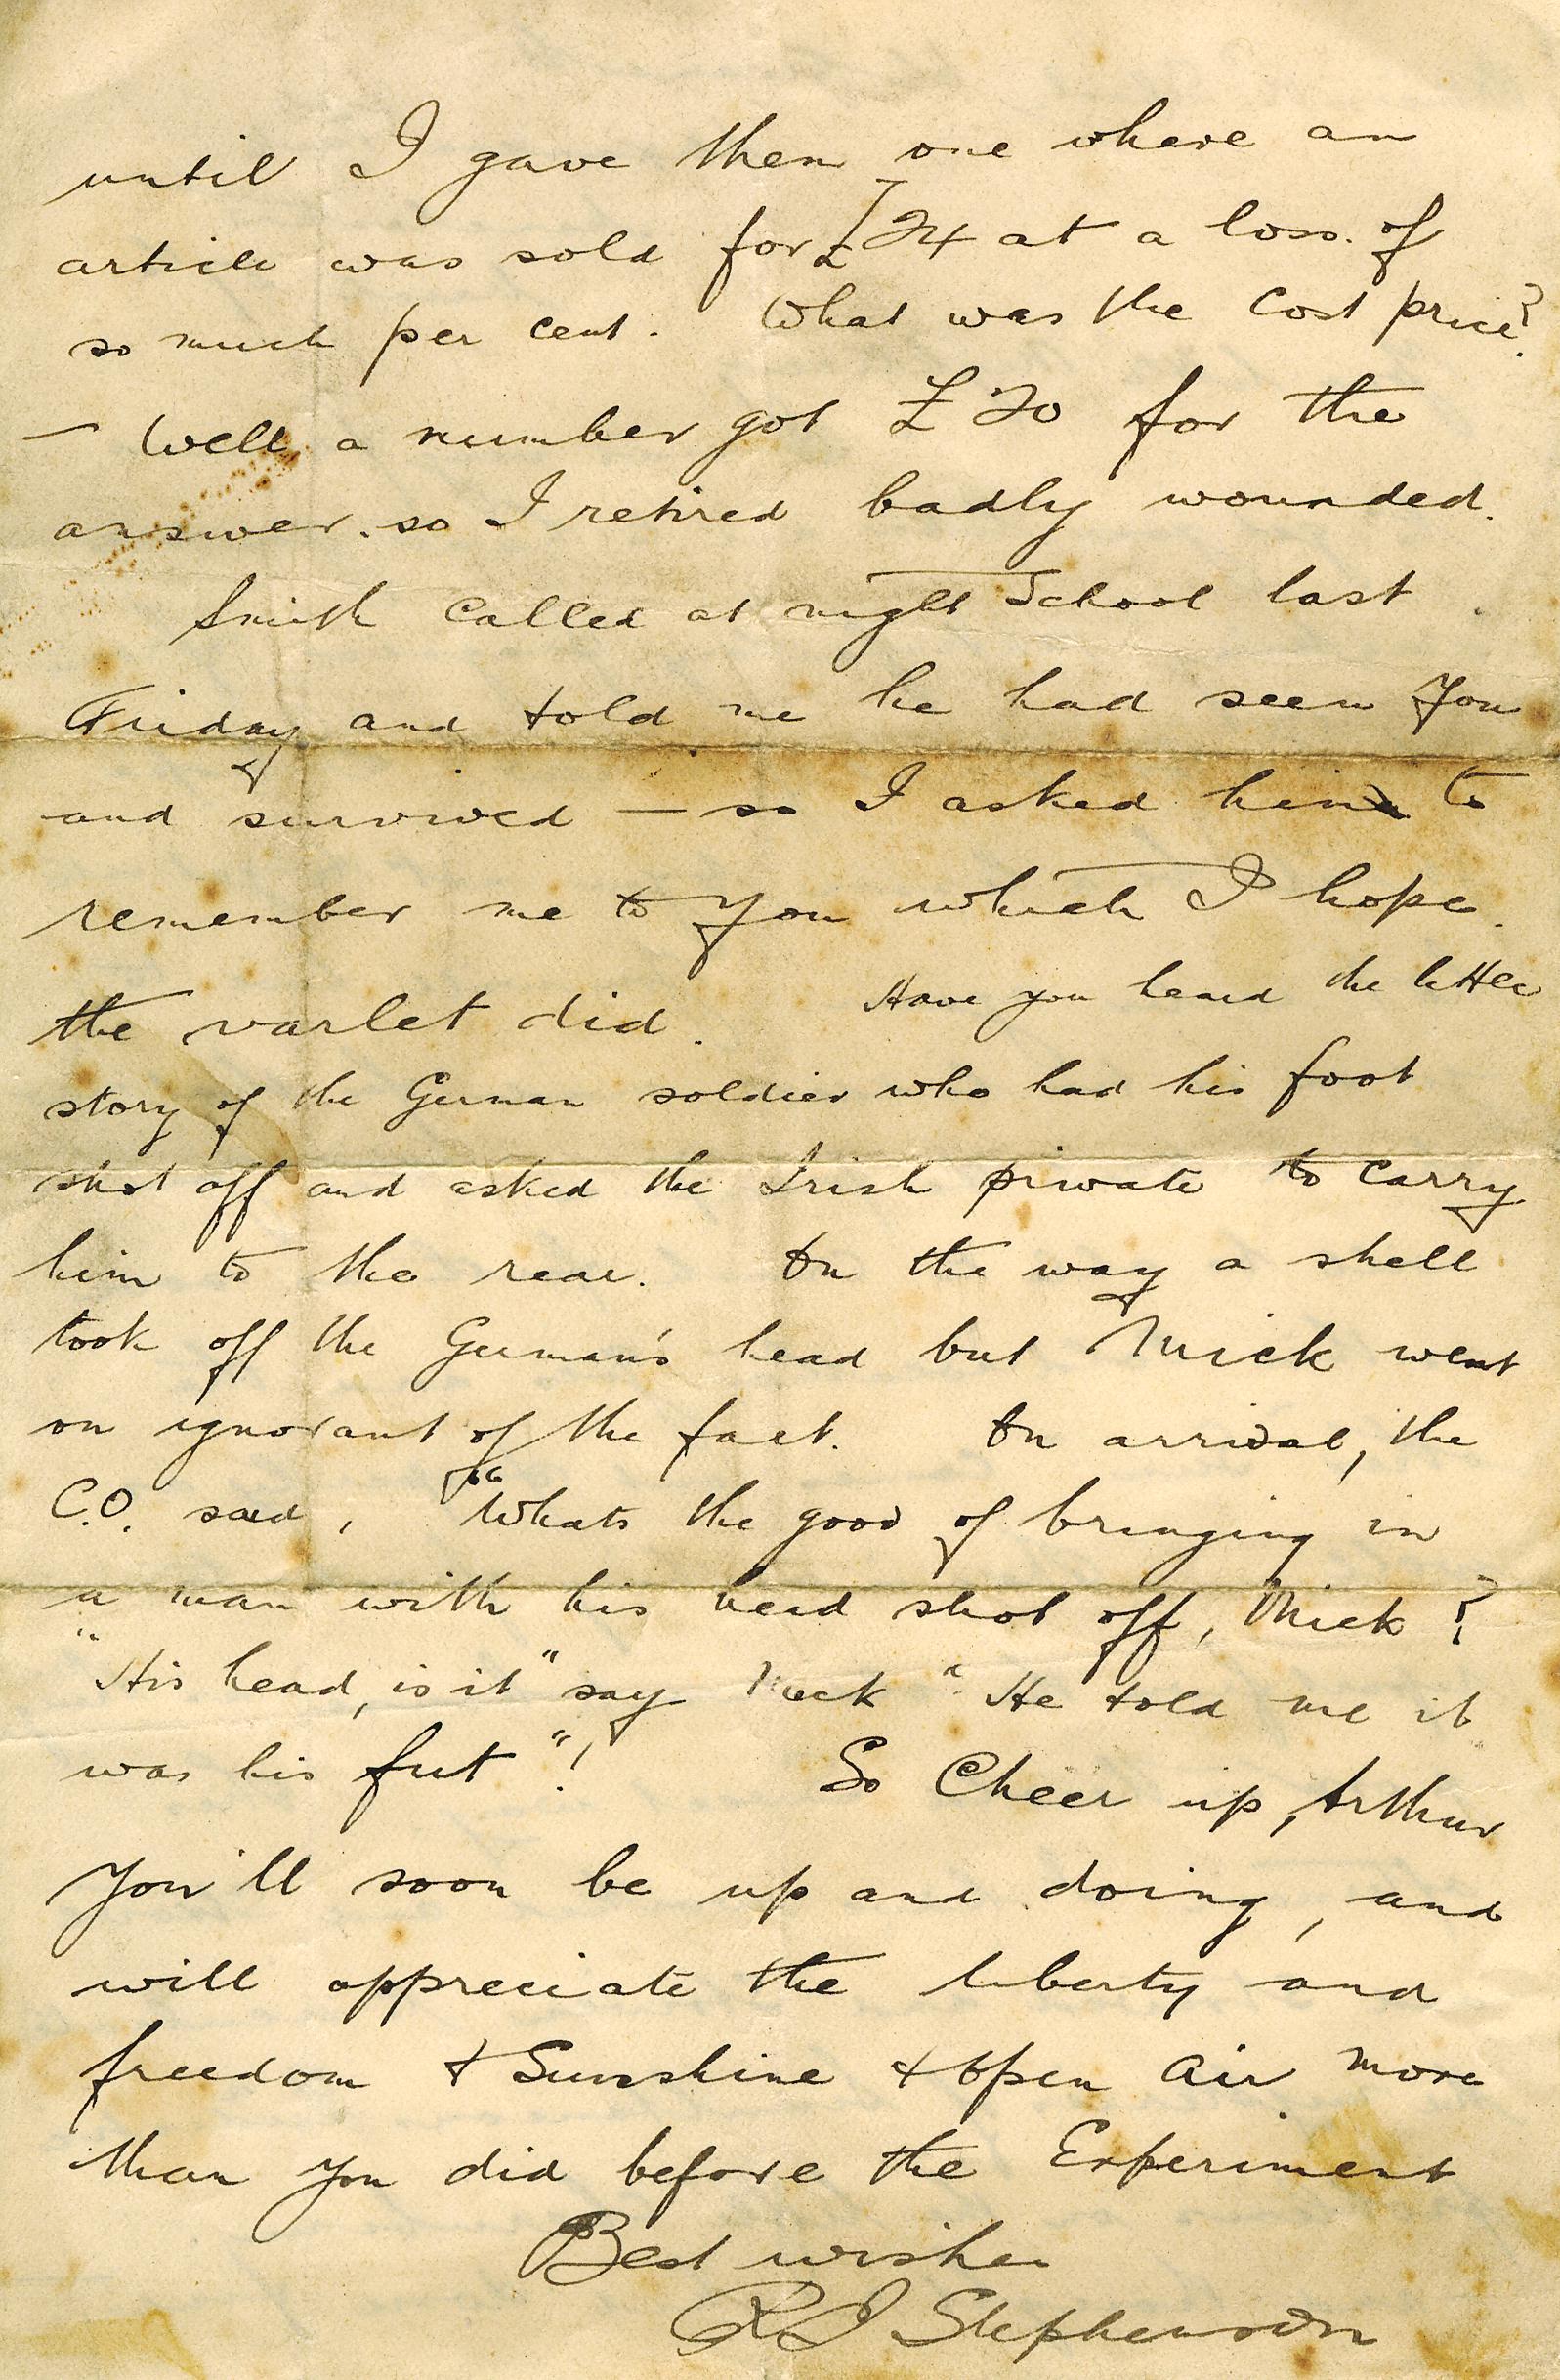 File:Old Letter.jpg - Wikimedia Commons